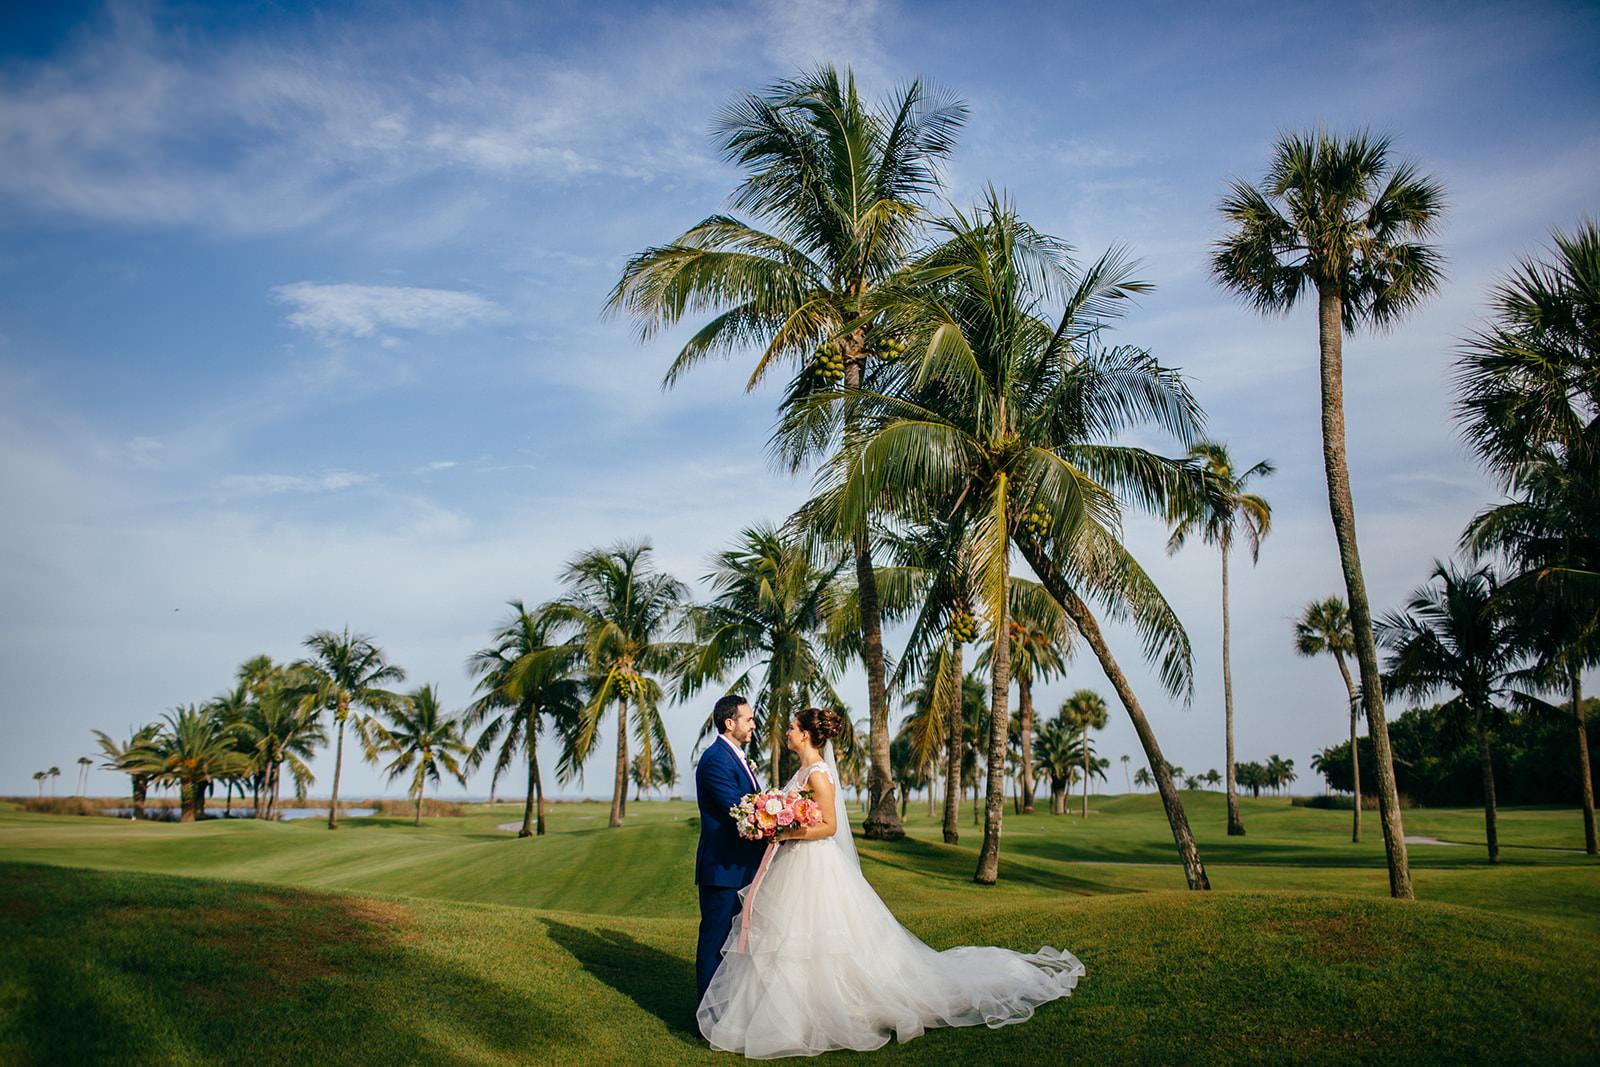 Tropical Tampa Bride and Groom on Golf Course at Boca Grande Wedding Venue Gasparilla Inn